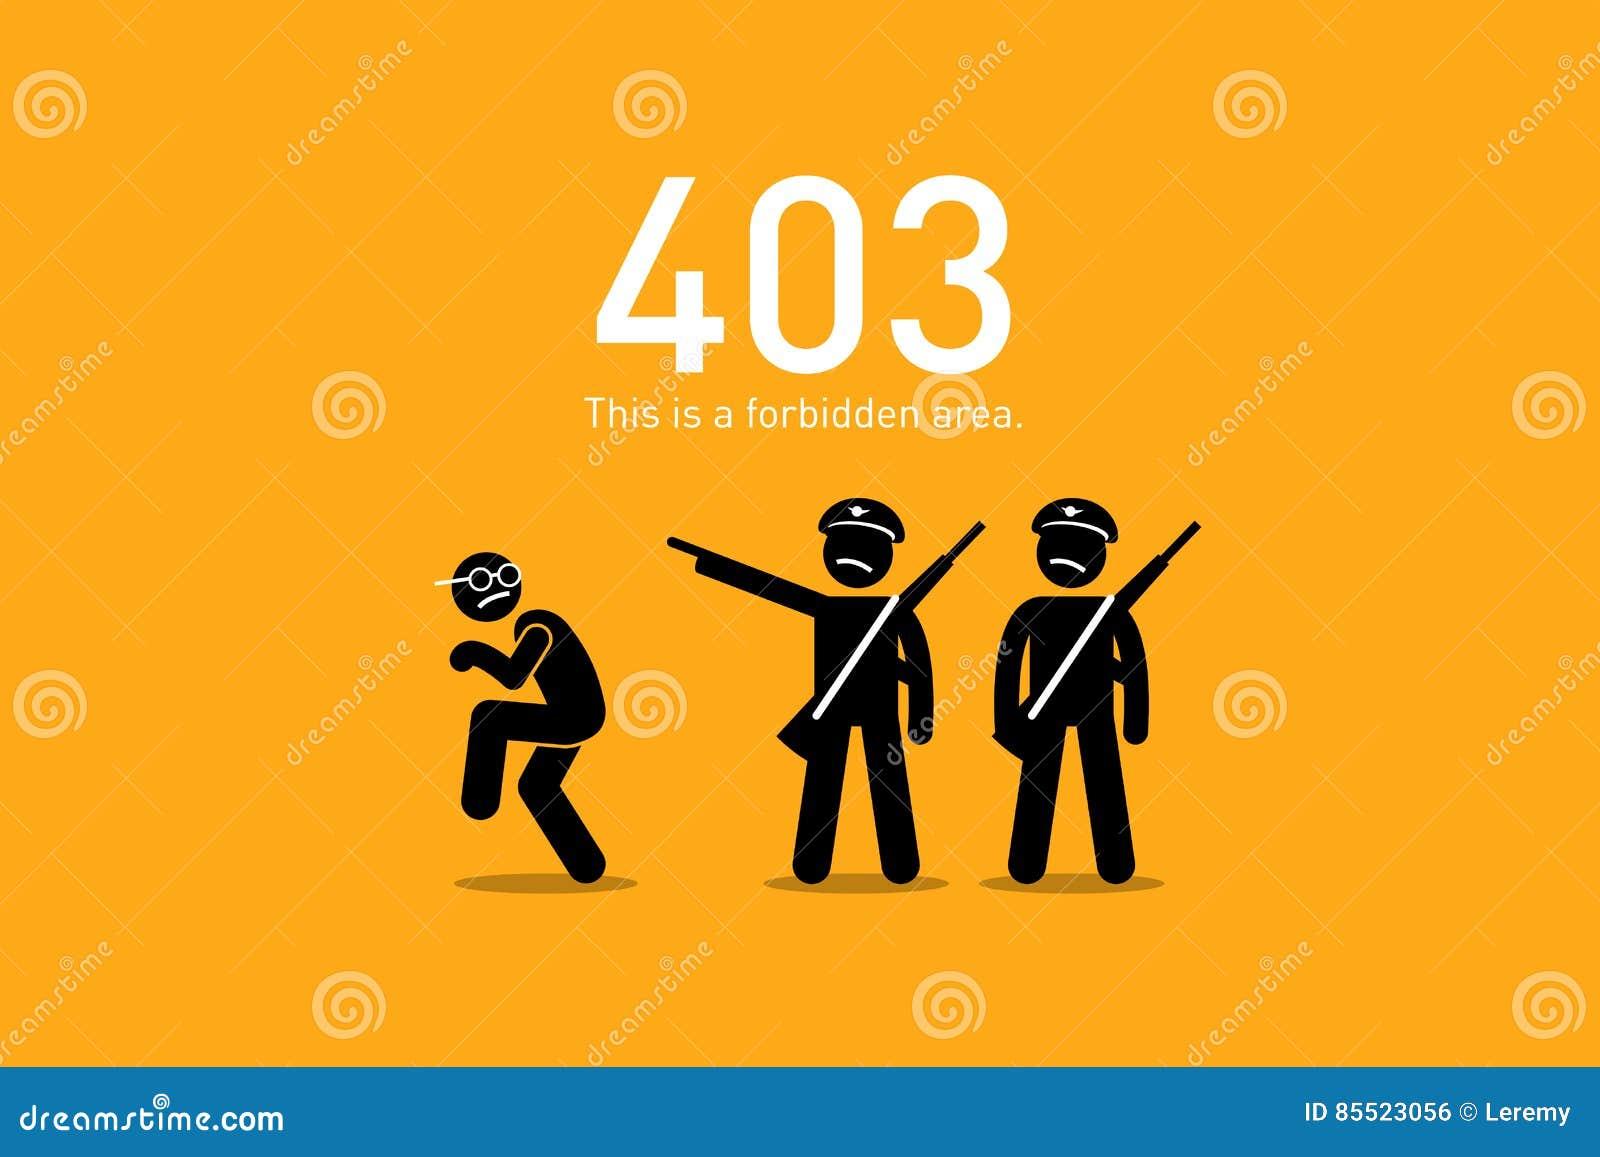 Error 403 what is it